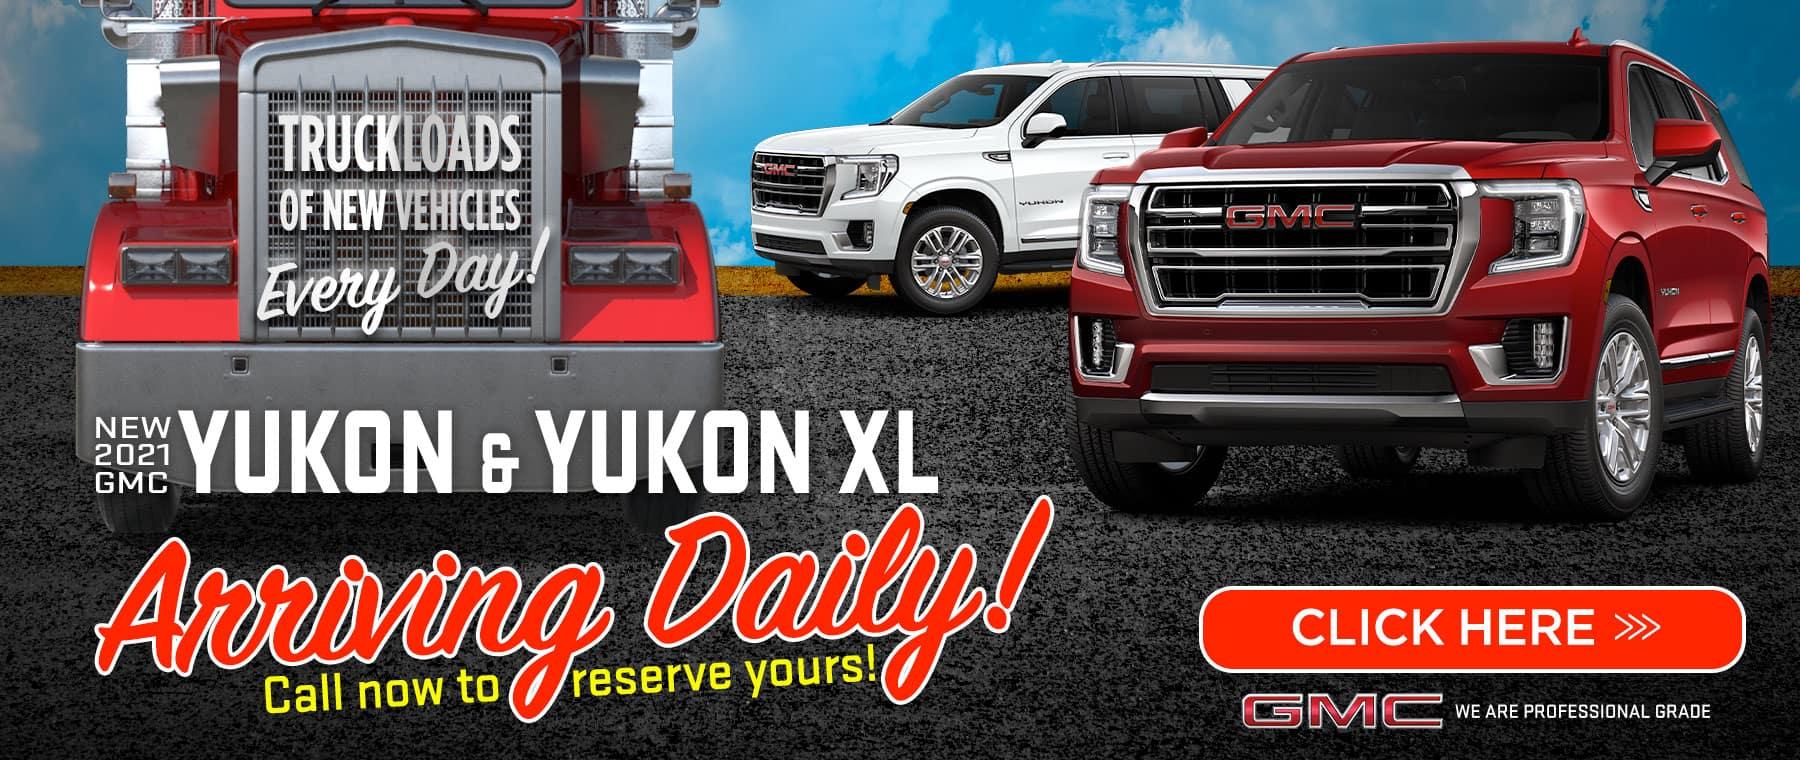 New 2021 Yukon & Yukon XL - Arriving Daily